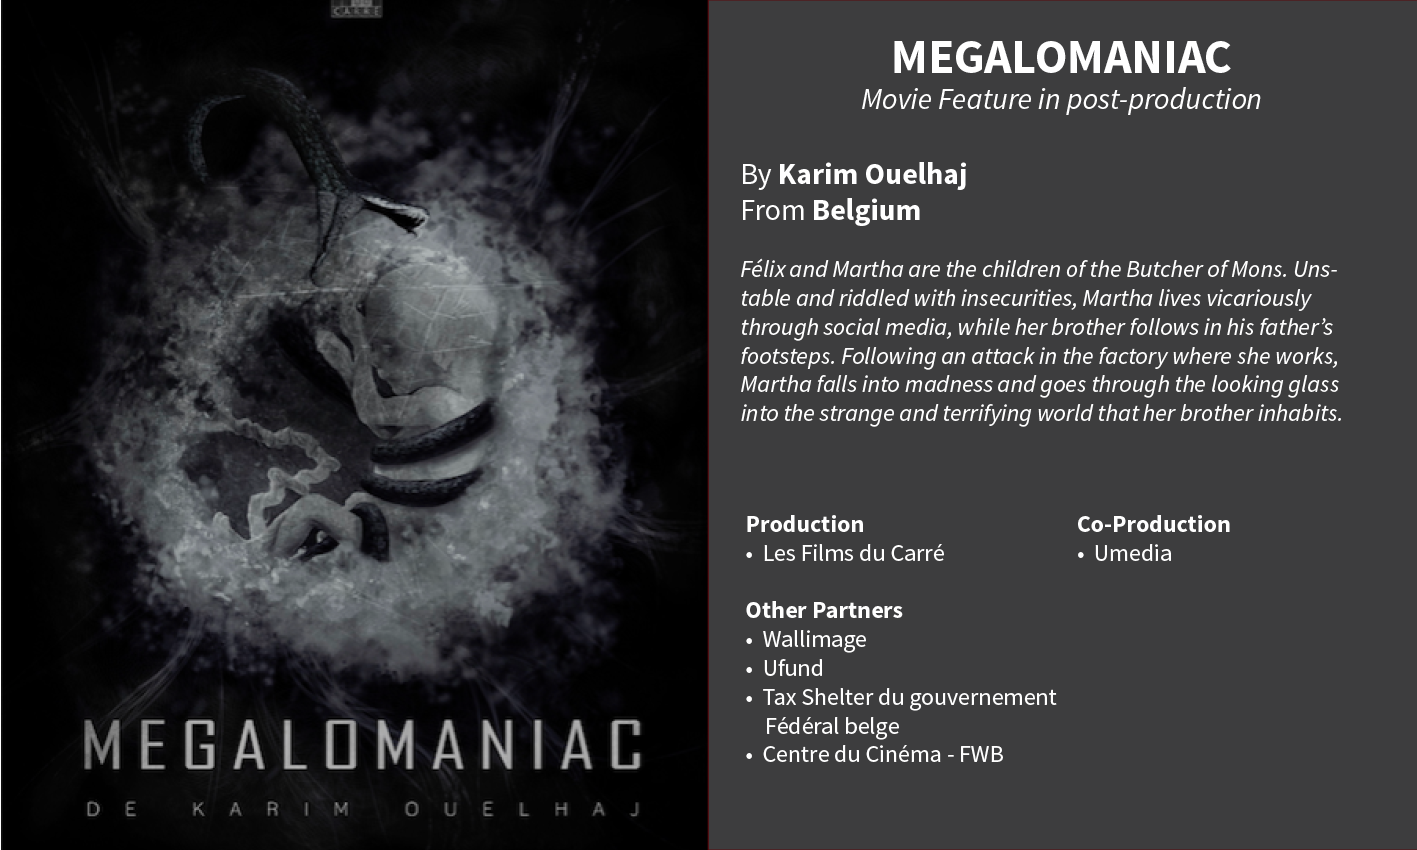 Megalomaniac - Karim Ouelhaj